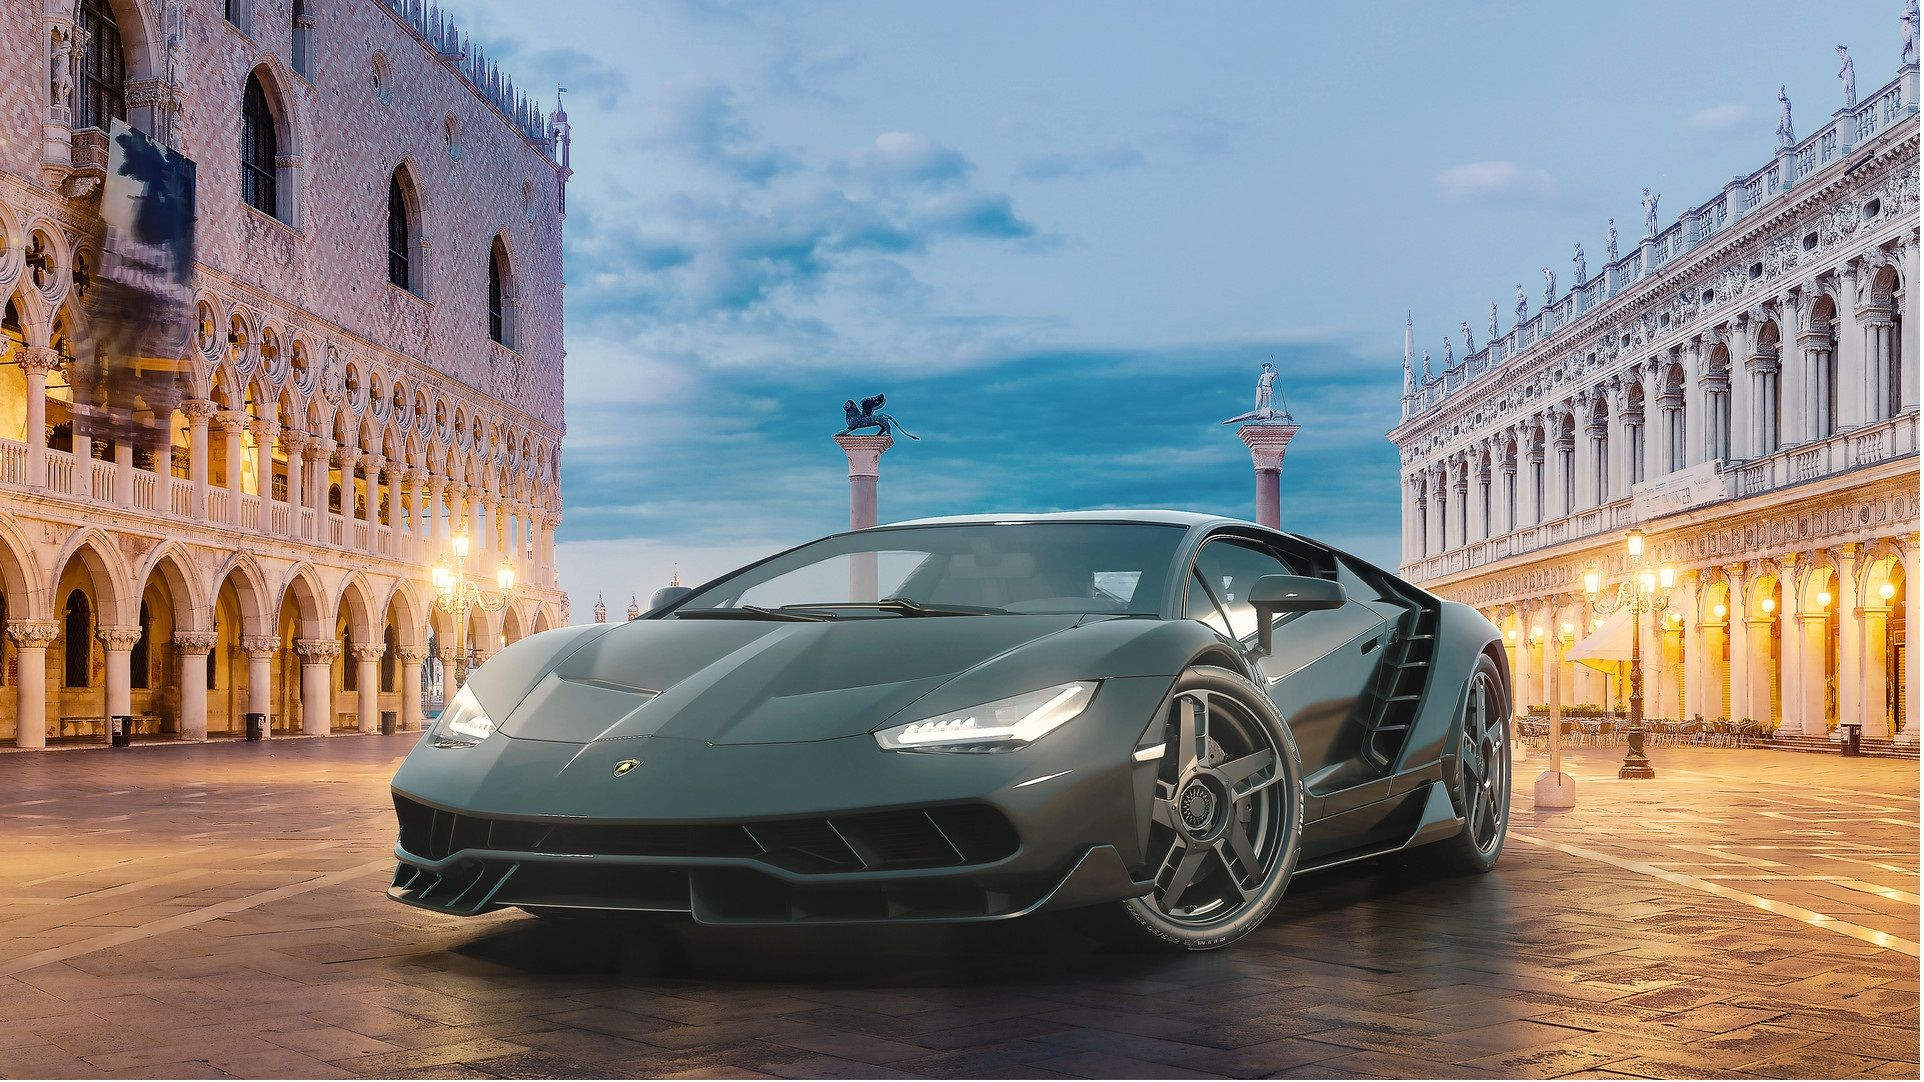 Supercars Rental In Venice Luxury Car Rental Luxury Car Hire Super Cars